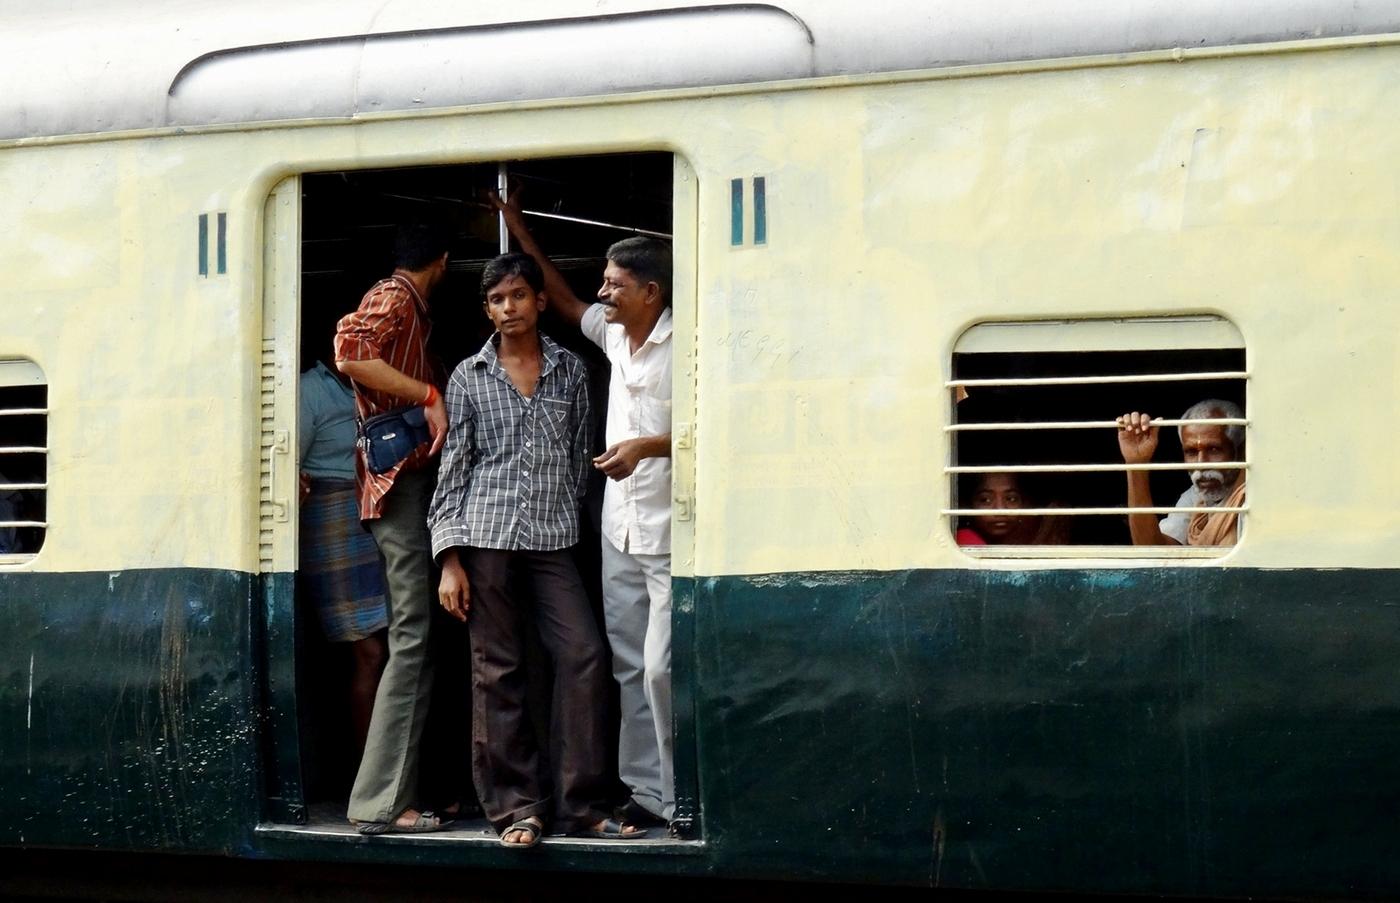 DCC-11Shoshana_Brower_1_Traveling_India